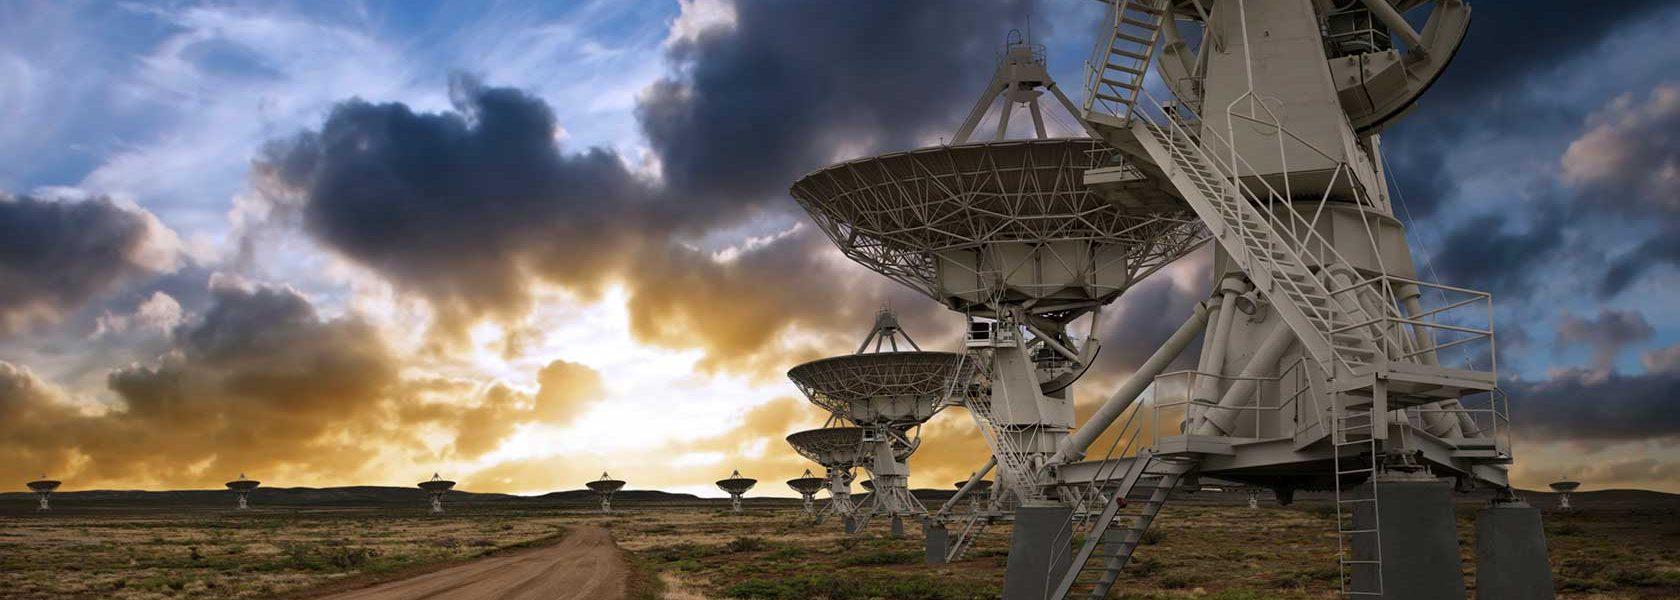 3.7 GHz Services